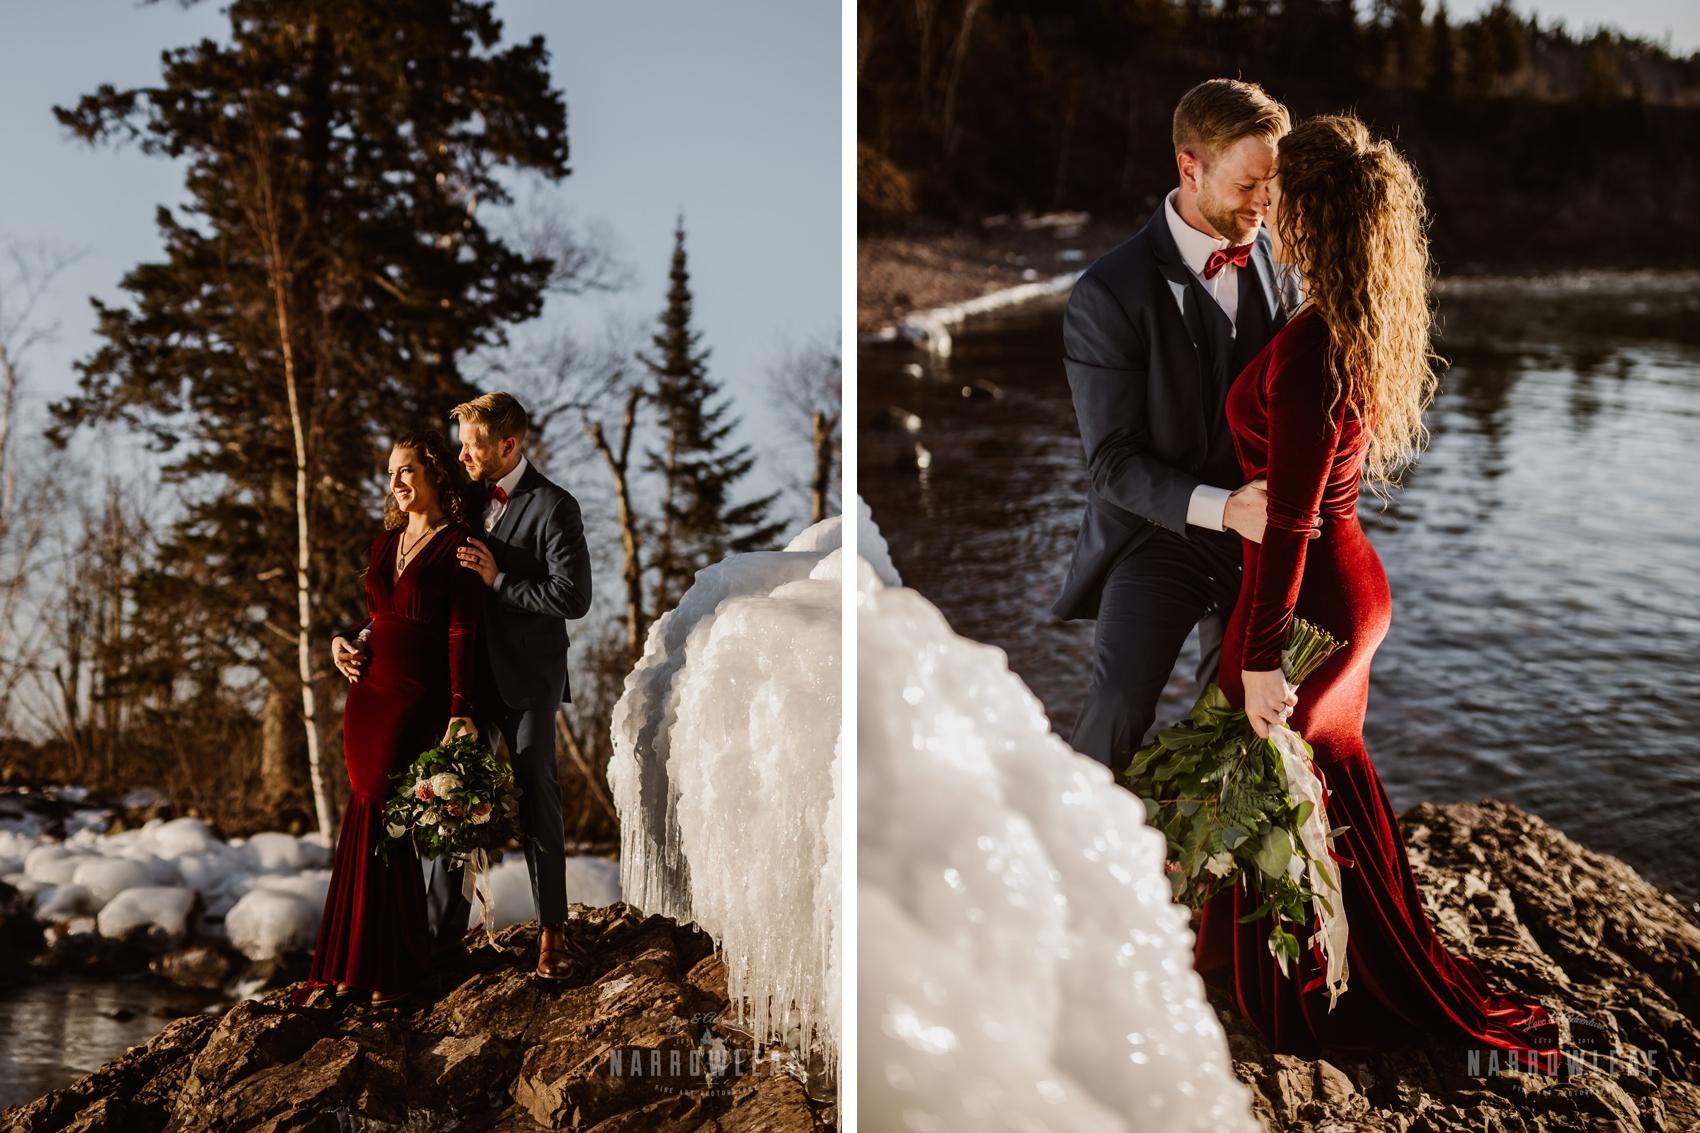 moody-winter-adventure-elopement-red-velvet-dress-minnesota-narrowleaf-photography.jpg